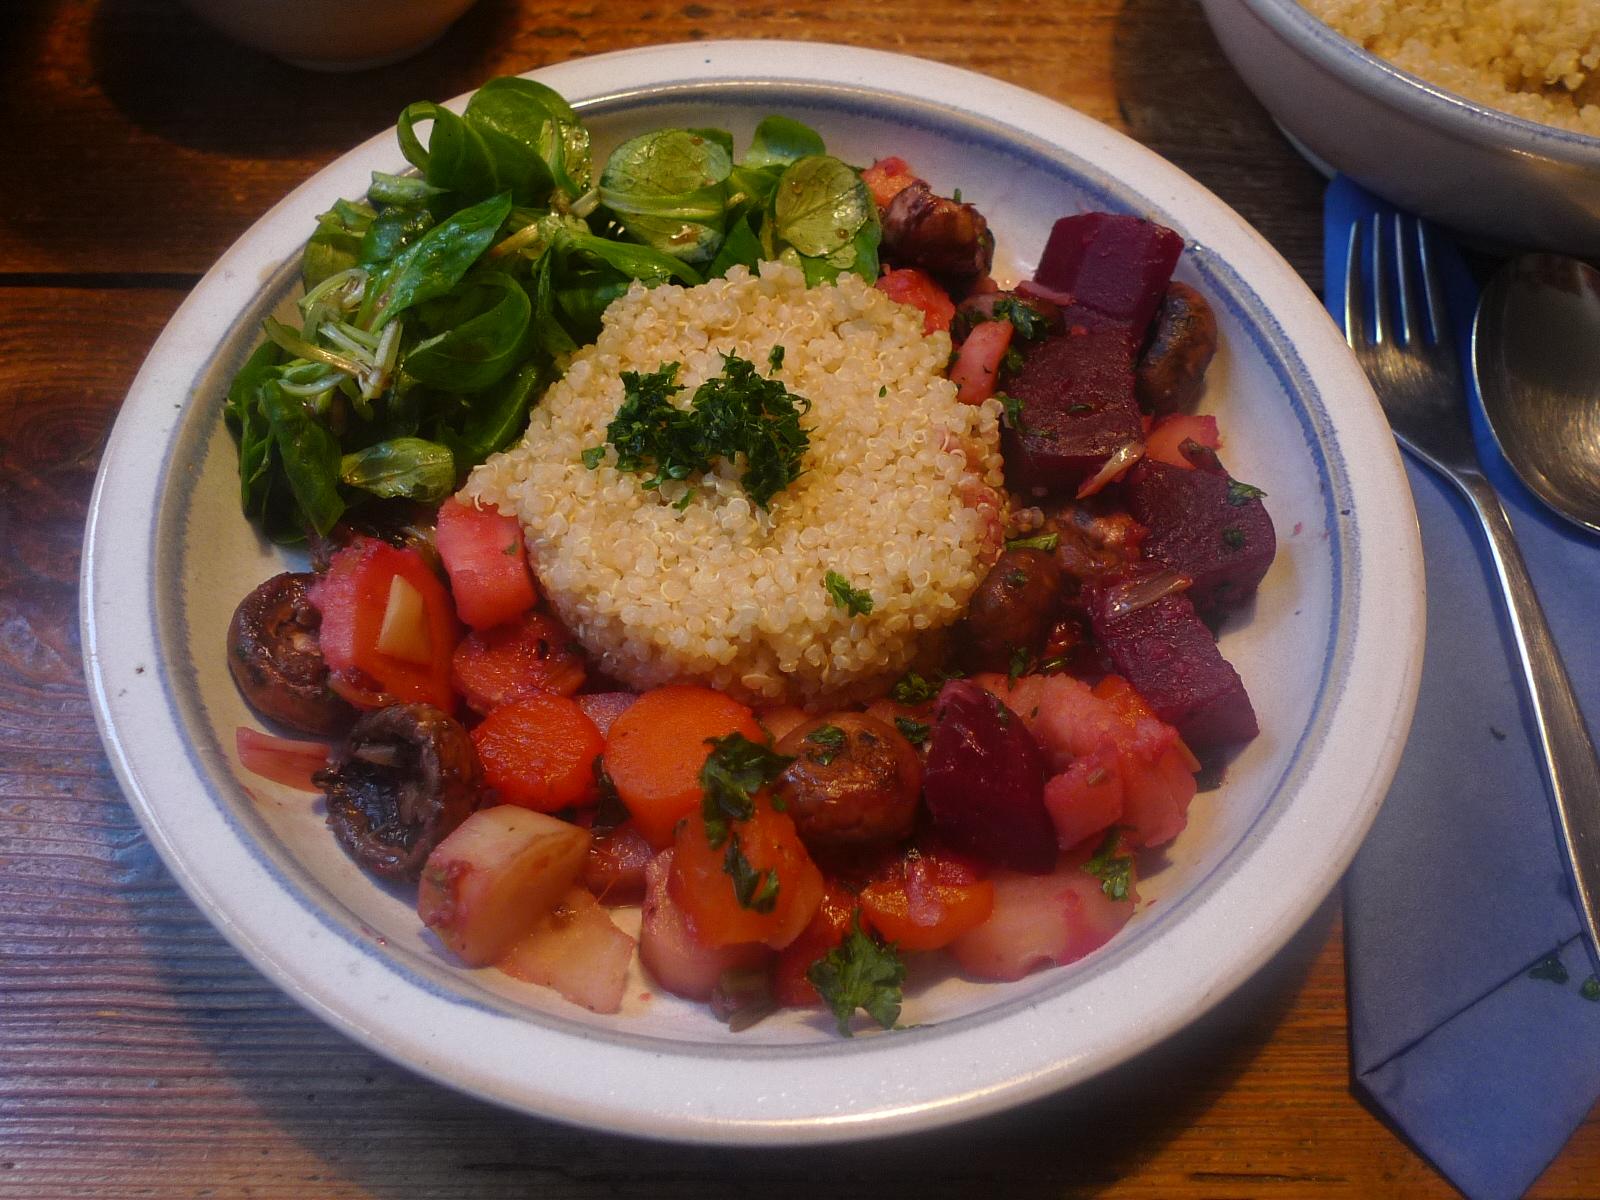 Wurzelgemüse-Quinoa-Feldsalat - 22.11.14   (15)